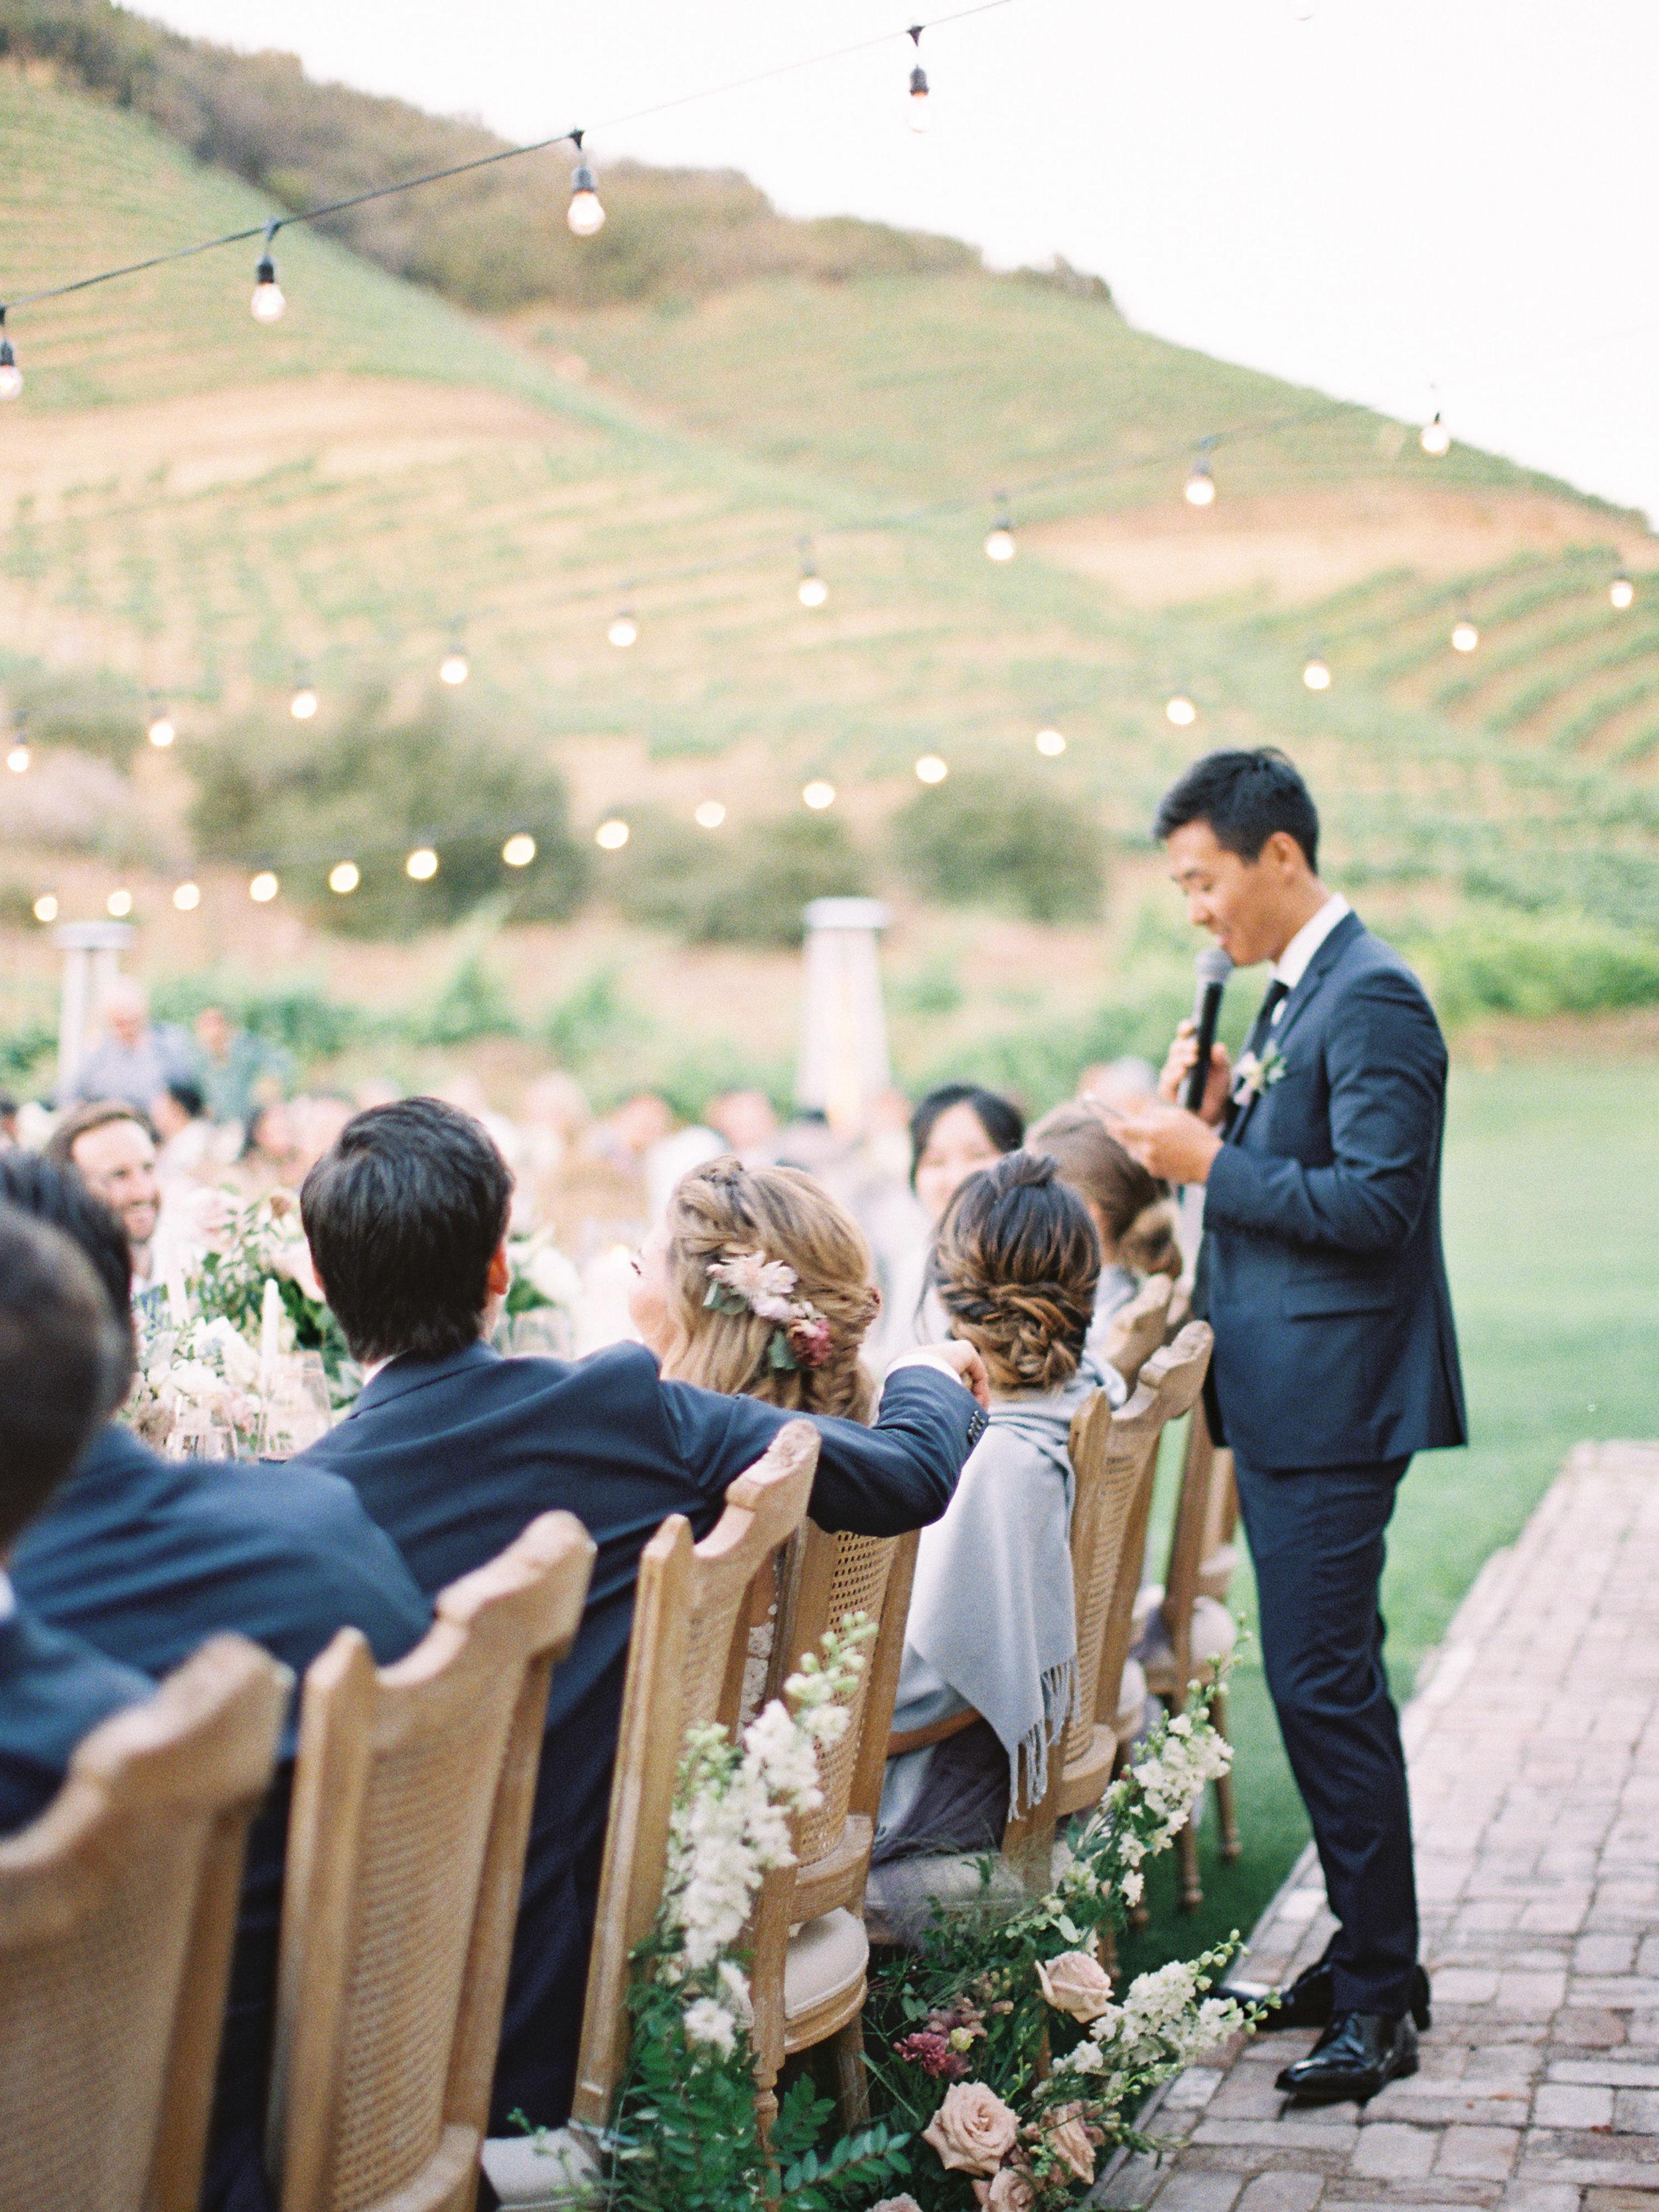 Triunfo_Creek_Winery_Wedding-278-Jen-Huang-JL-295-Jen-Huang-009962-R1-034.jpg